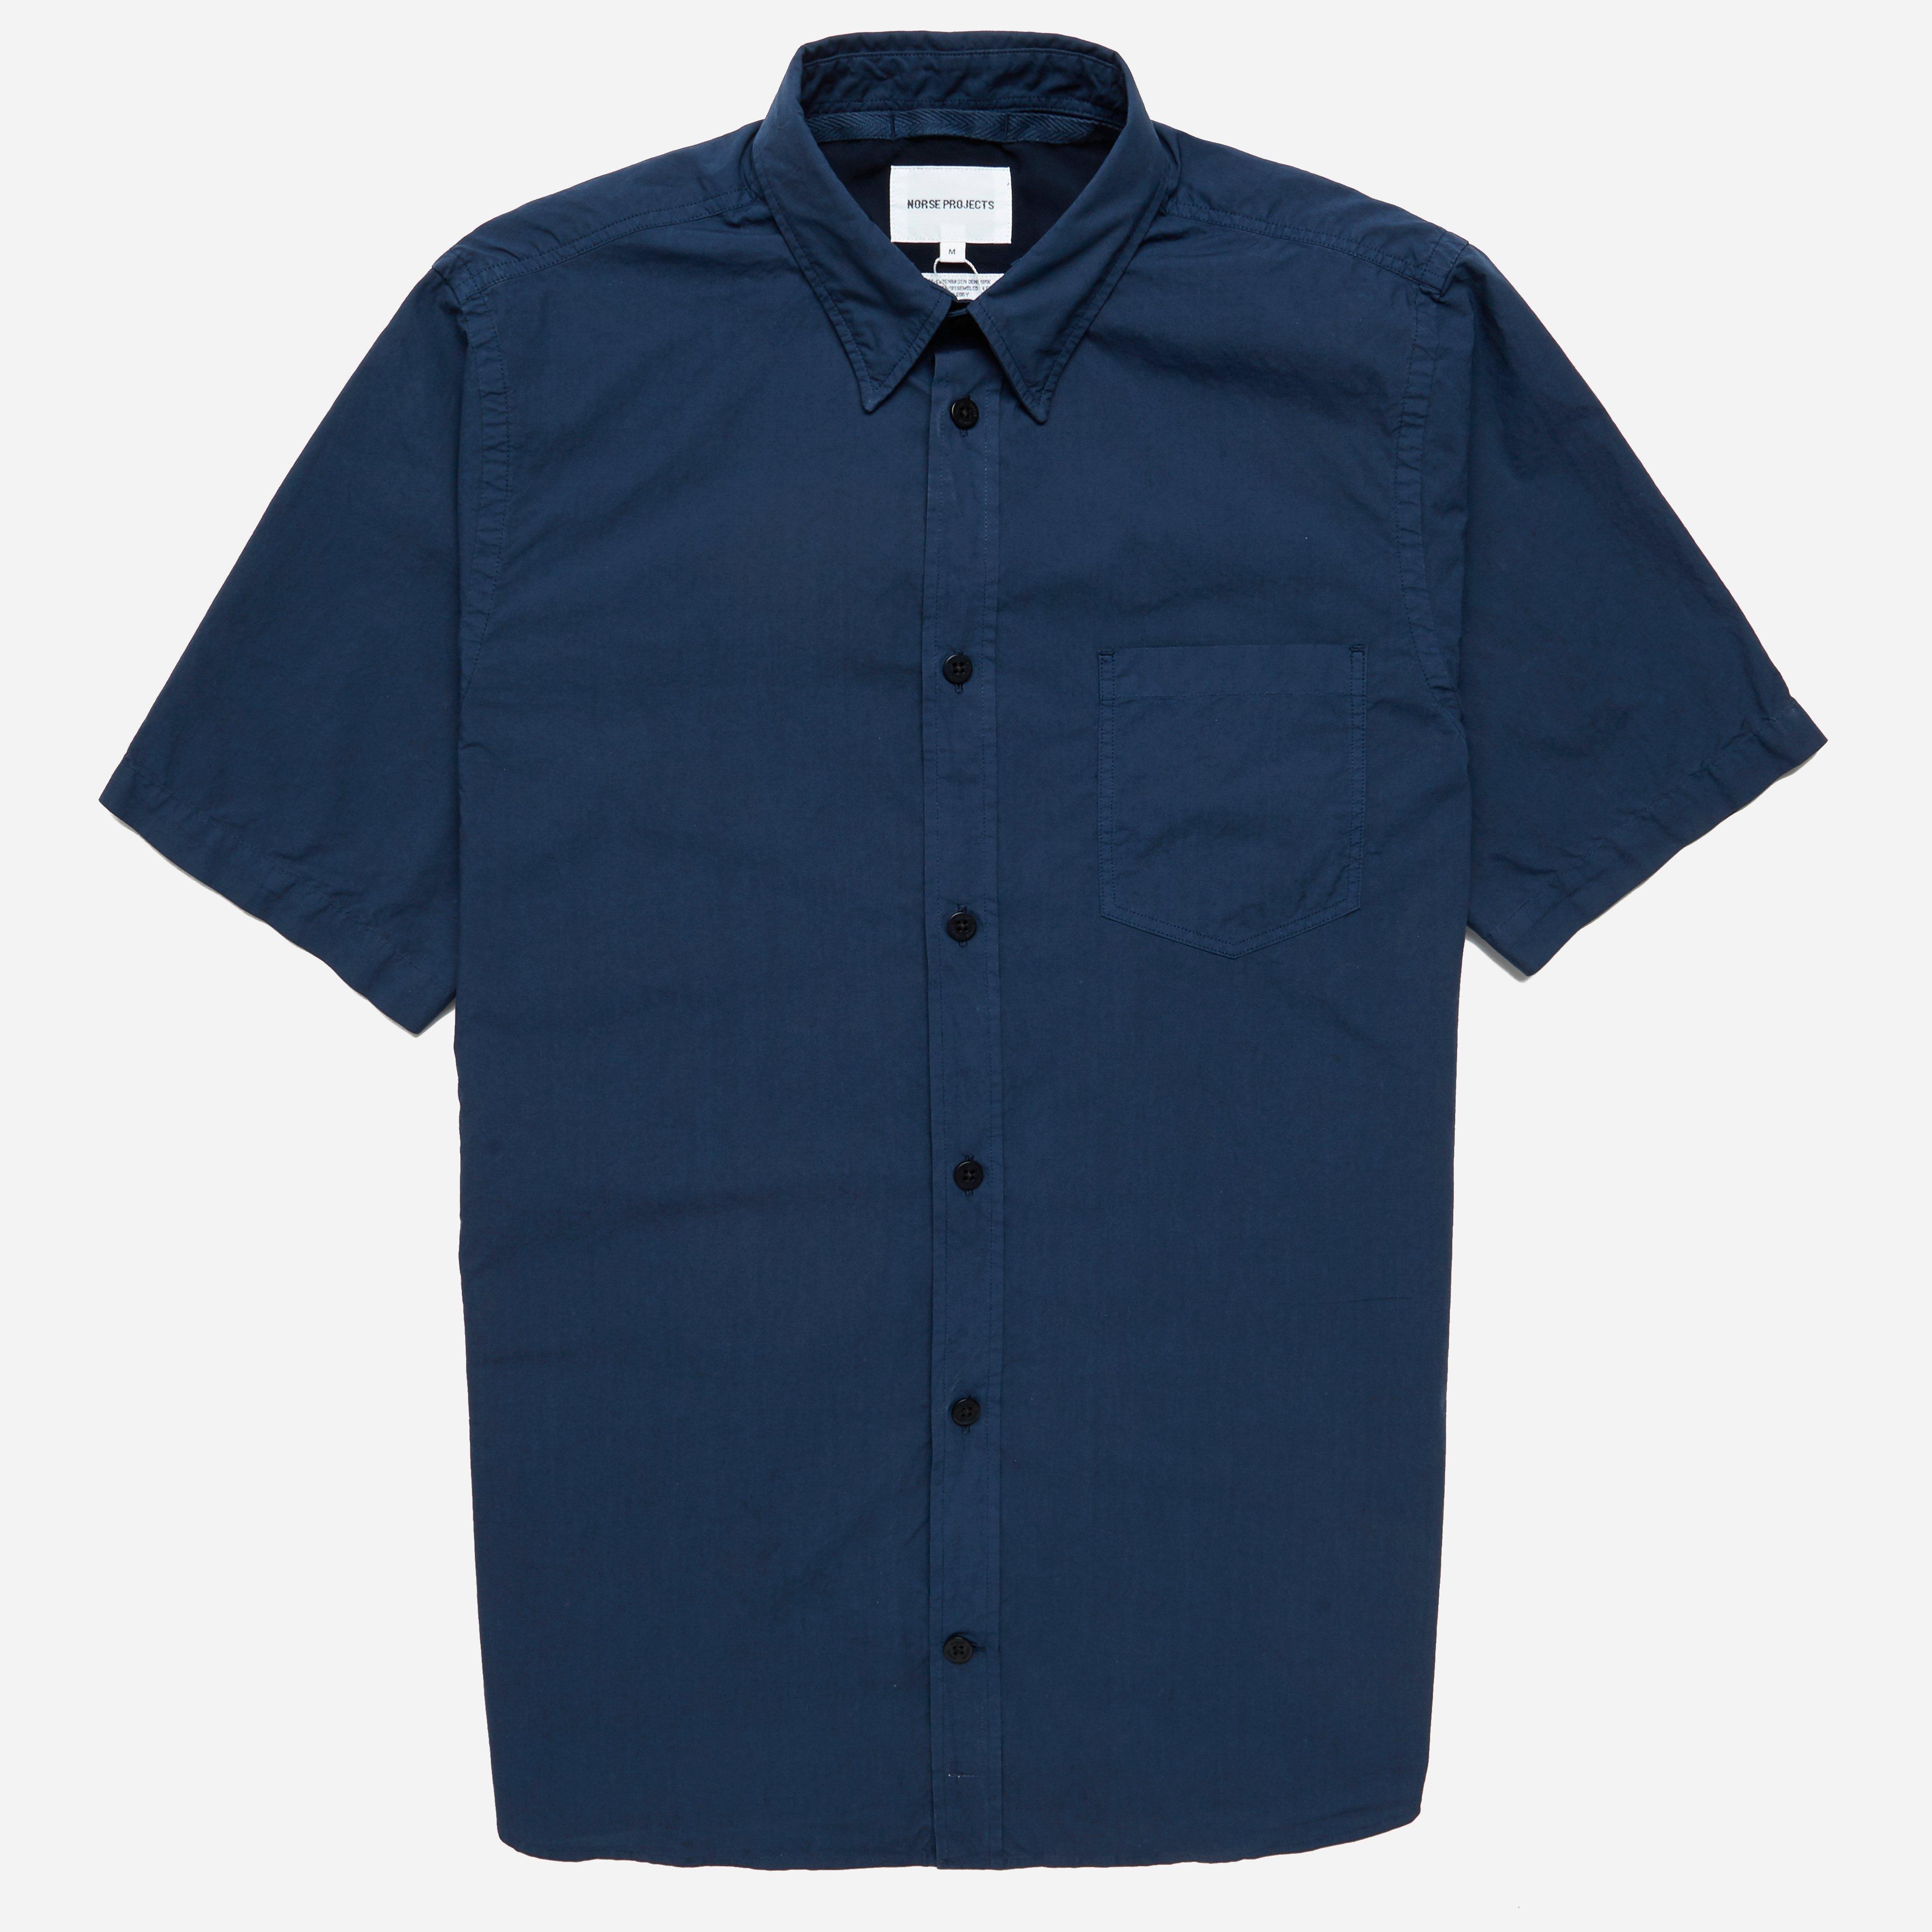 Norse Projects Anton Garment Dyed Poplin Short Sleeve Shirt